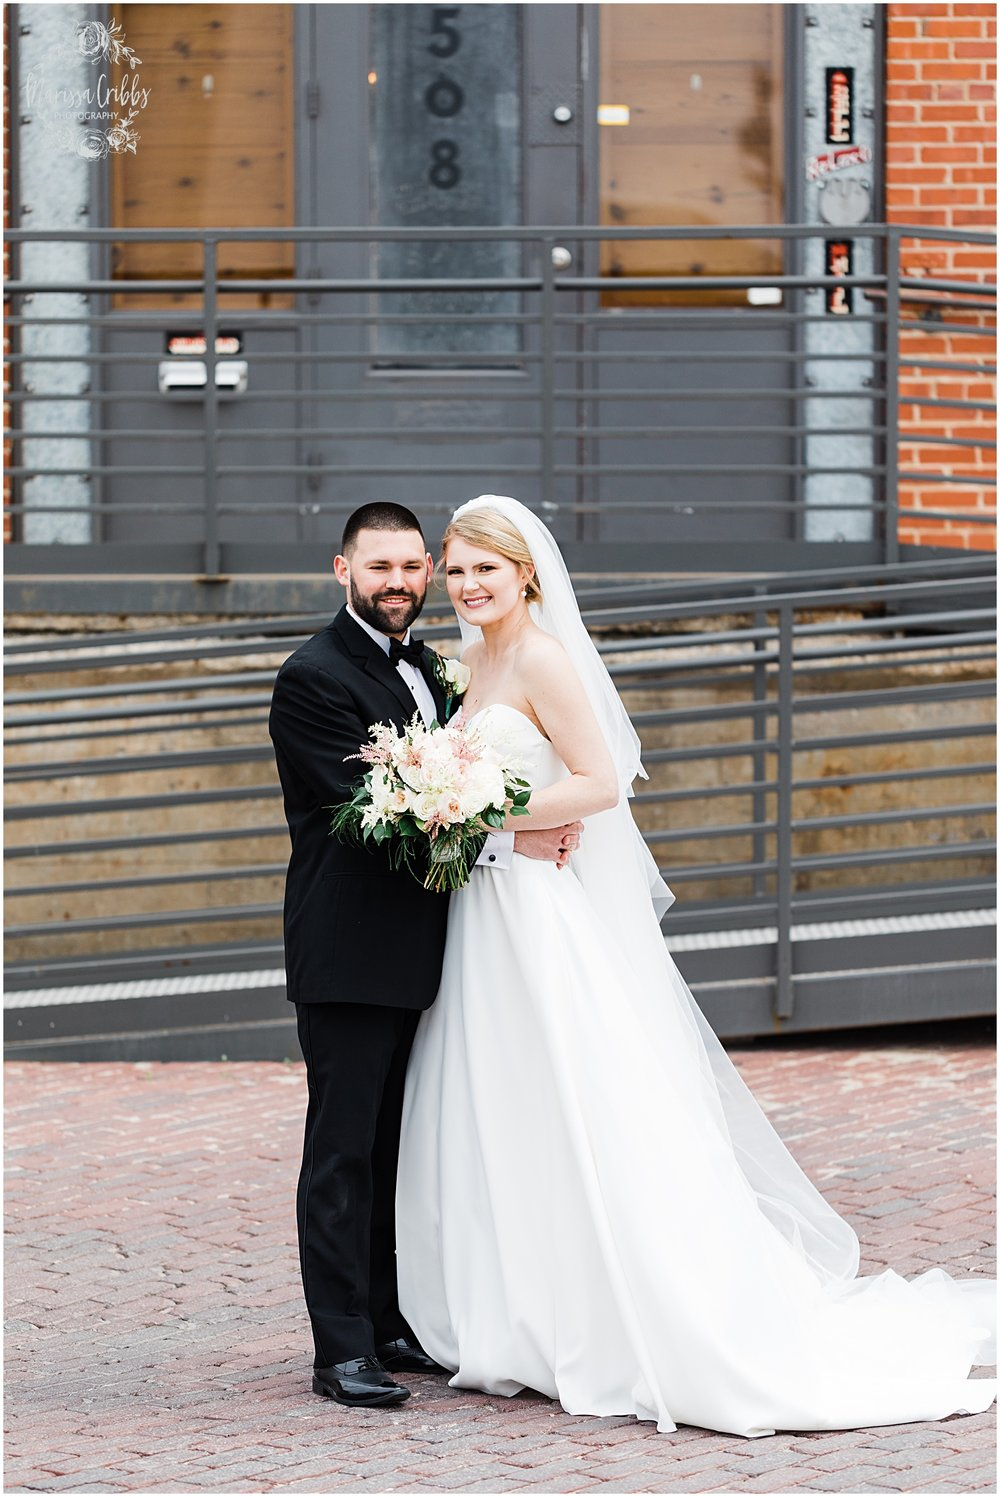 ABBY & CHARLIE WEDDING   THE HUDSON EVENT SPACE WEDDING   MARISSA CRIBBS PHOTOGRAPHY_7508.jpg